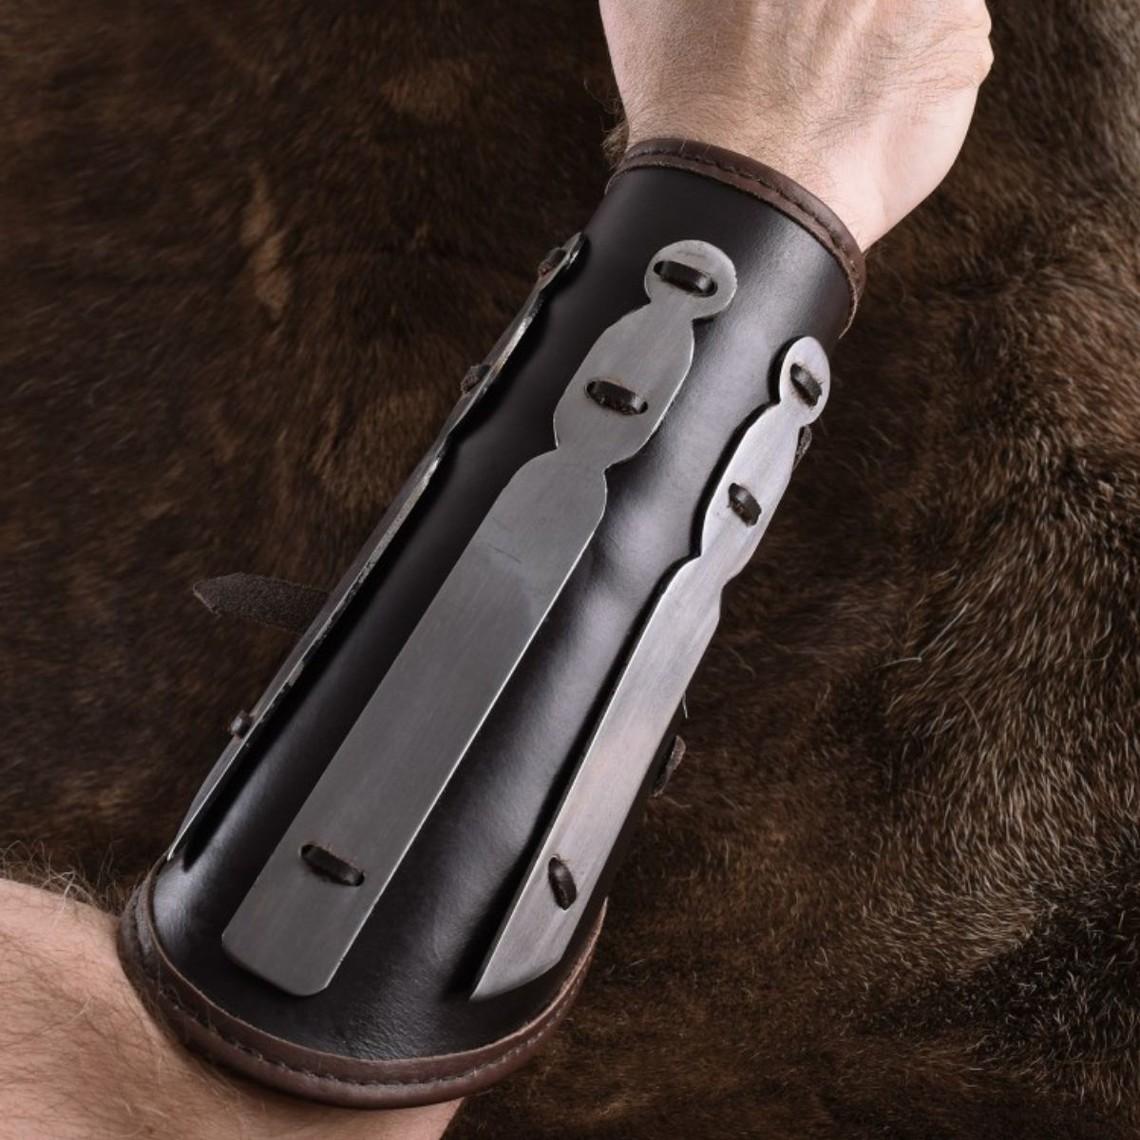 Ulfberth Leren armbeschermer met metalen strips Aerdwulf